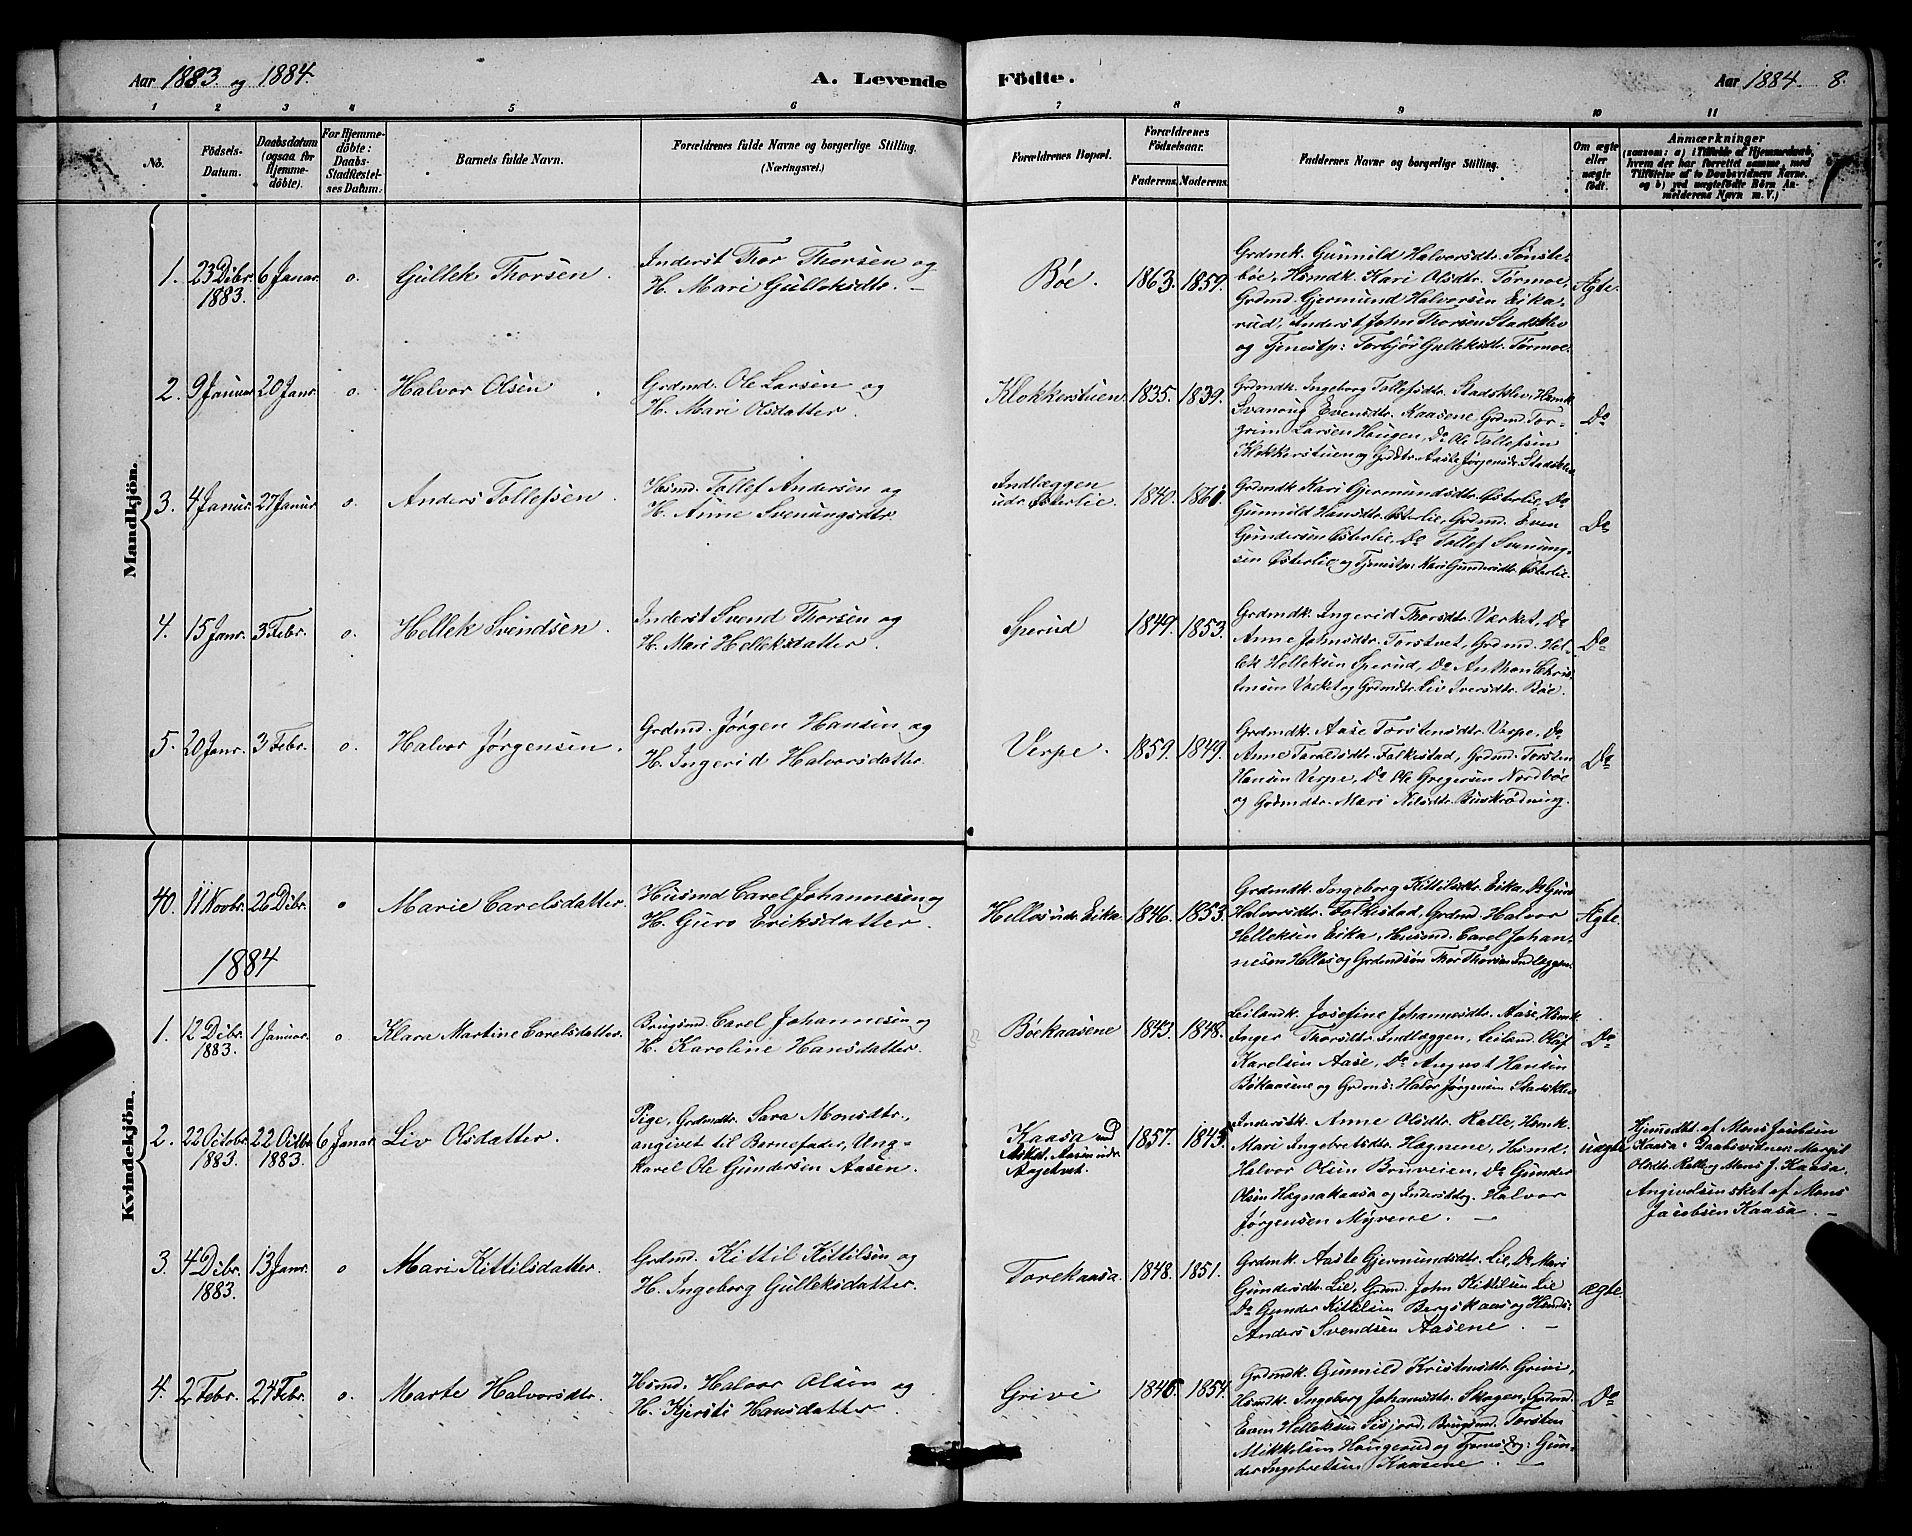 SAKO, Bø kirkebøker, G/Ga/L0005: Klokkerbok nr. 5, 1883-1897, s. 8